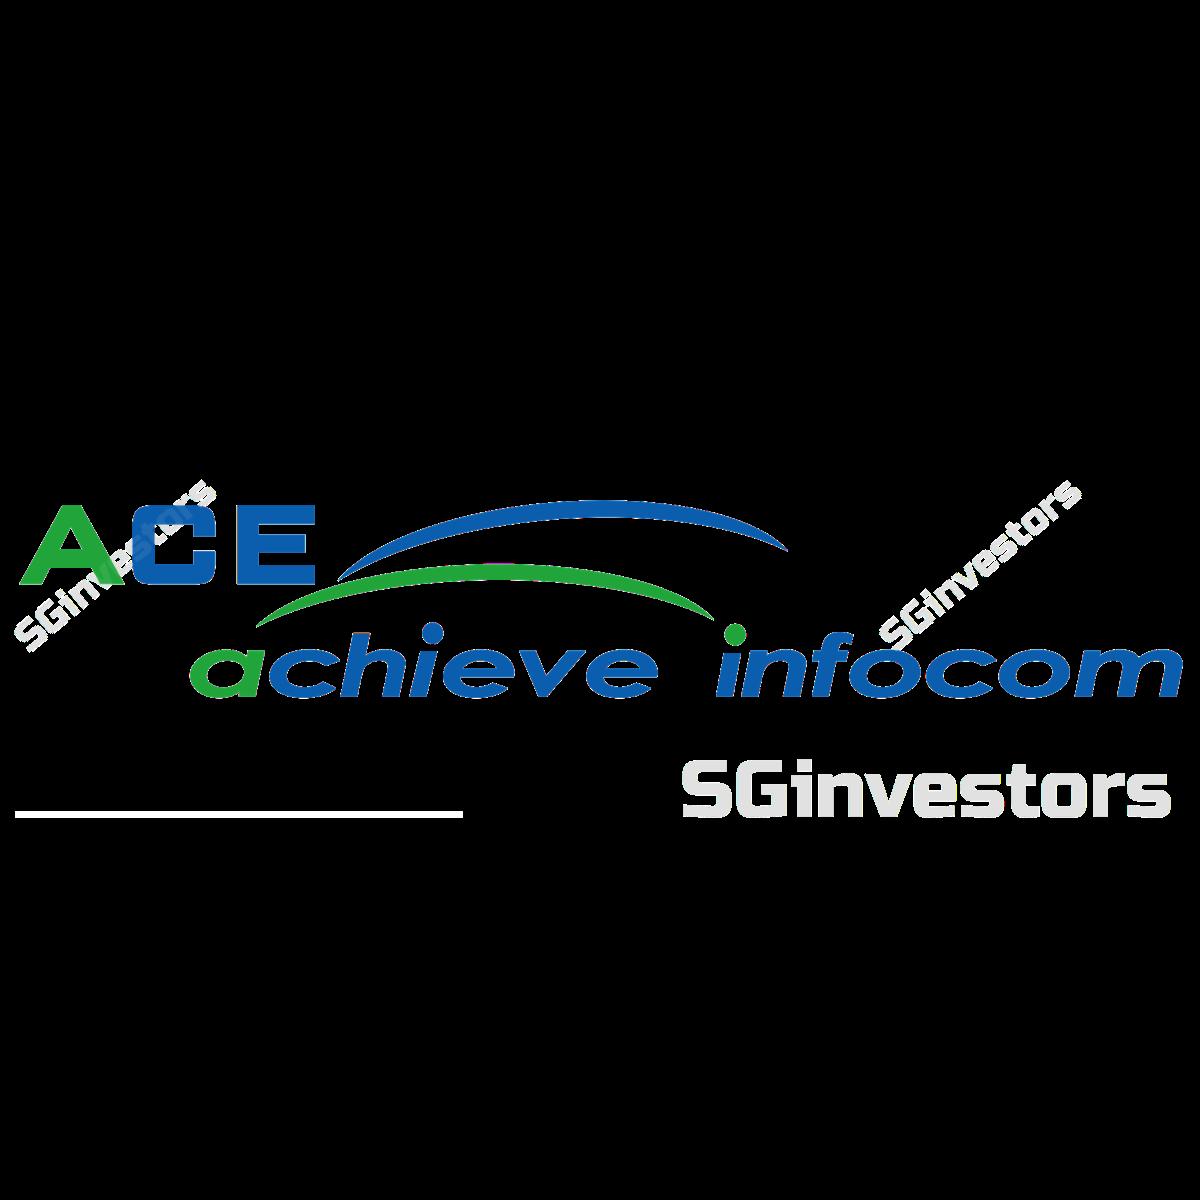 ACE ACHIEVE INFOCOM LIMITED (SGX:A75) @ SGinvestors.io